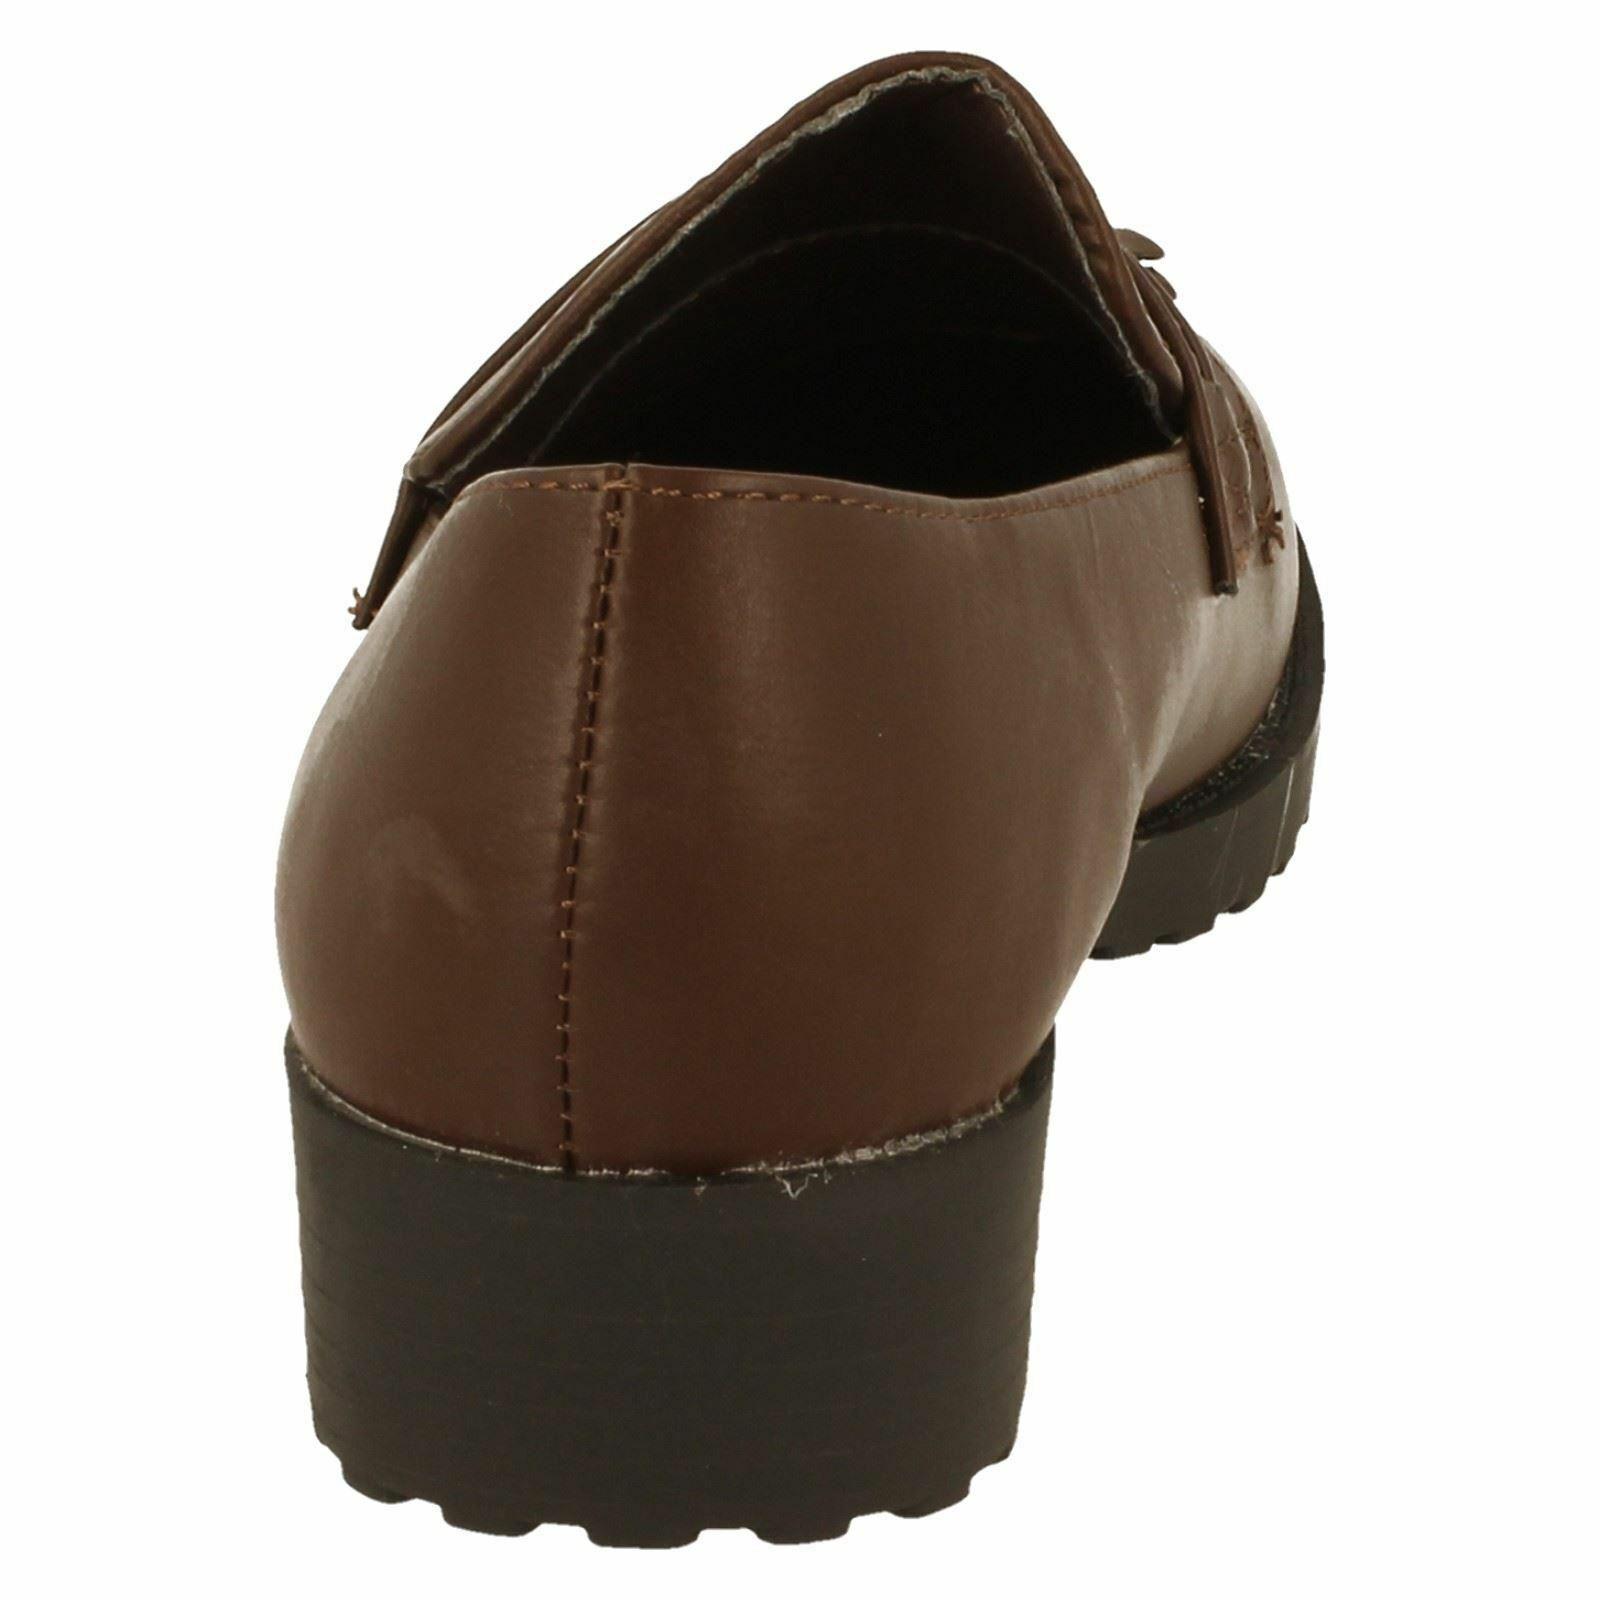 Spot On Childrens Girls Casual Tassel Trim Flat Loafers KM611